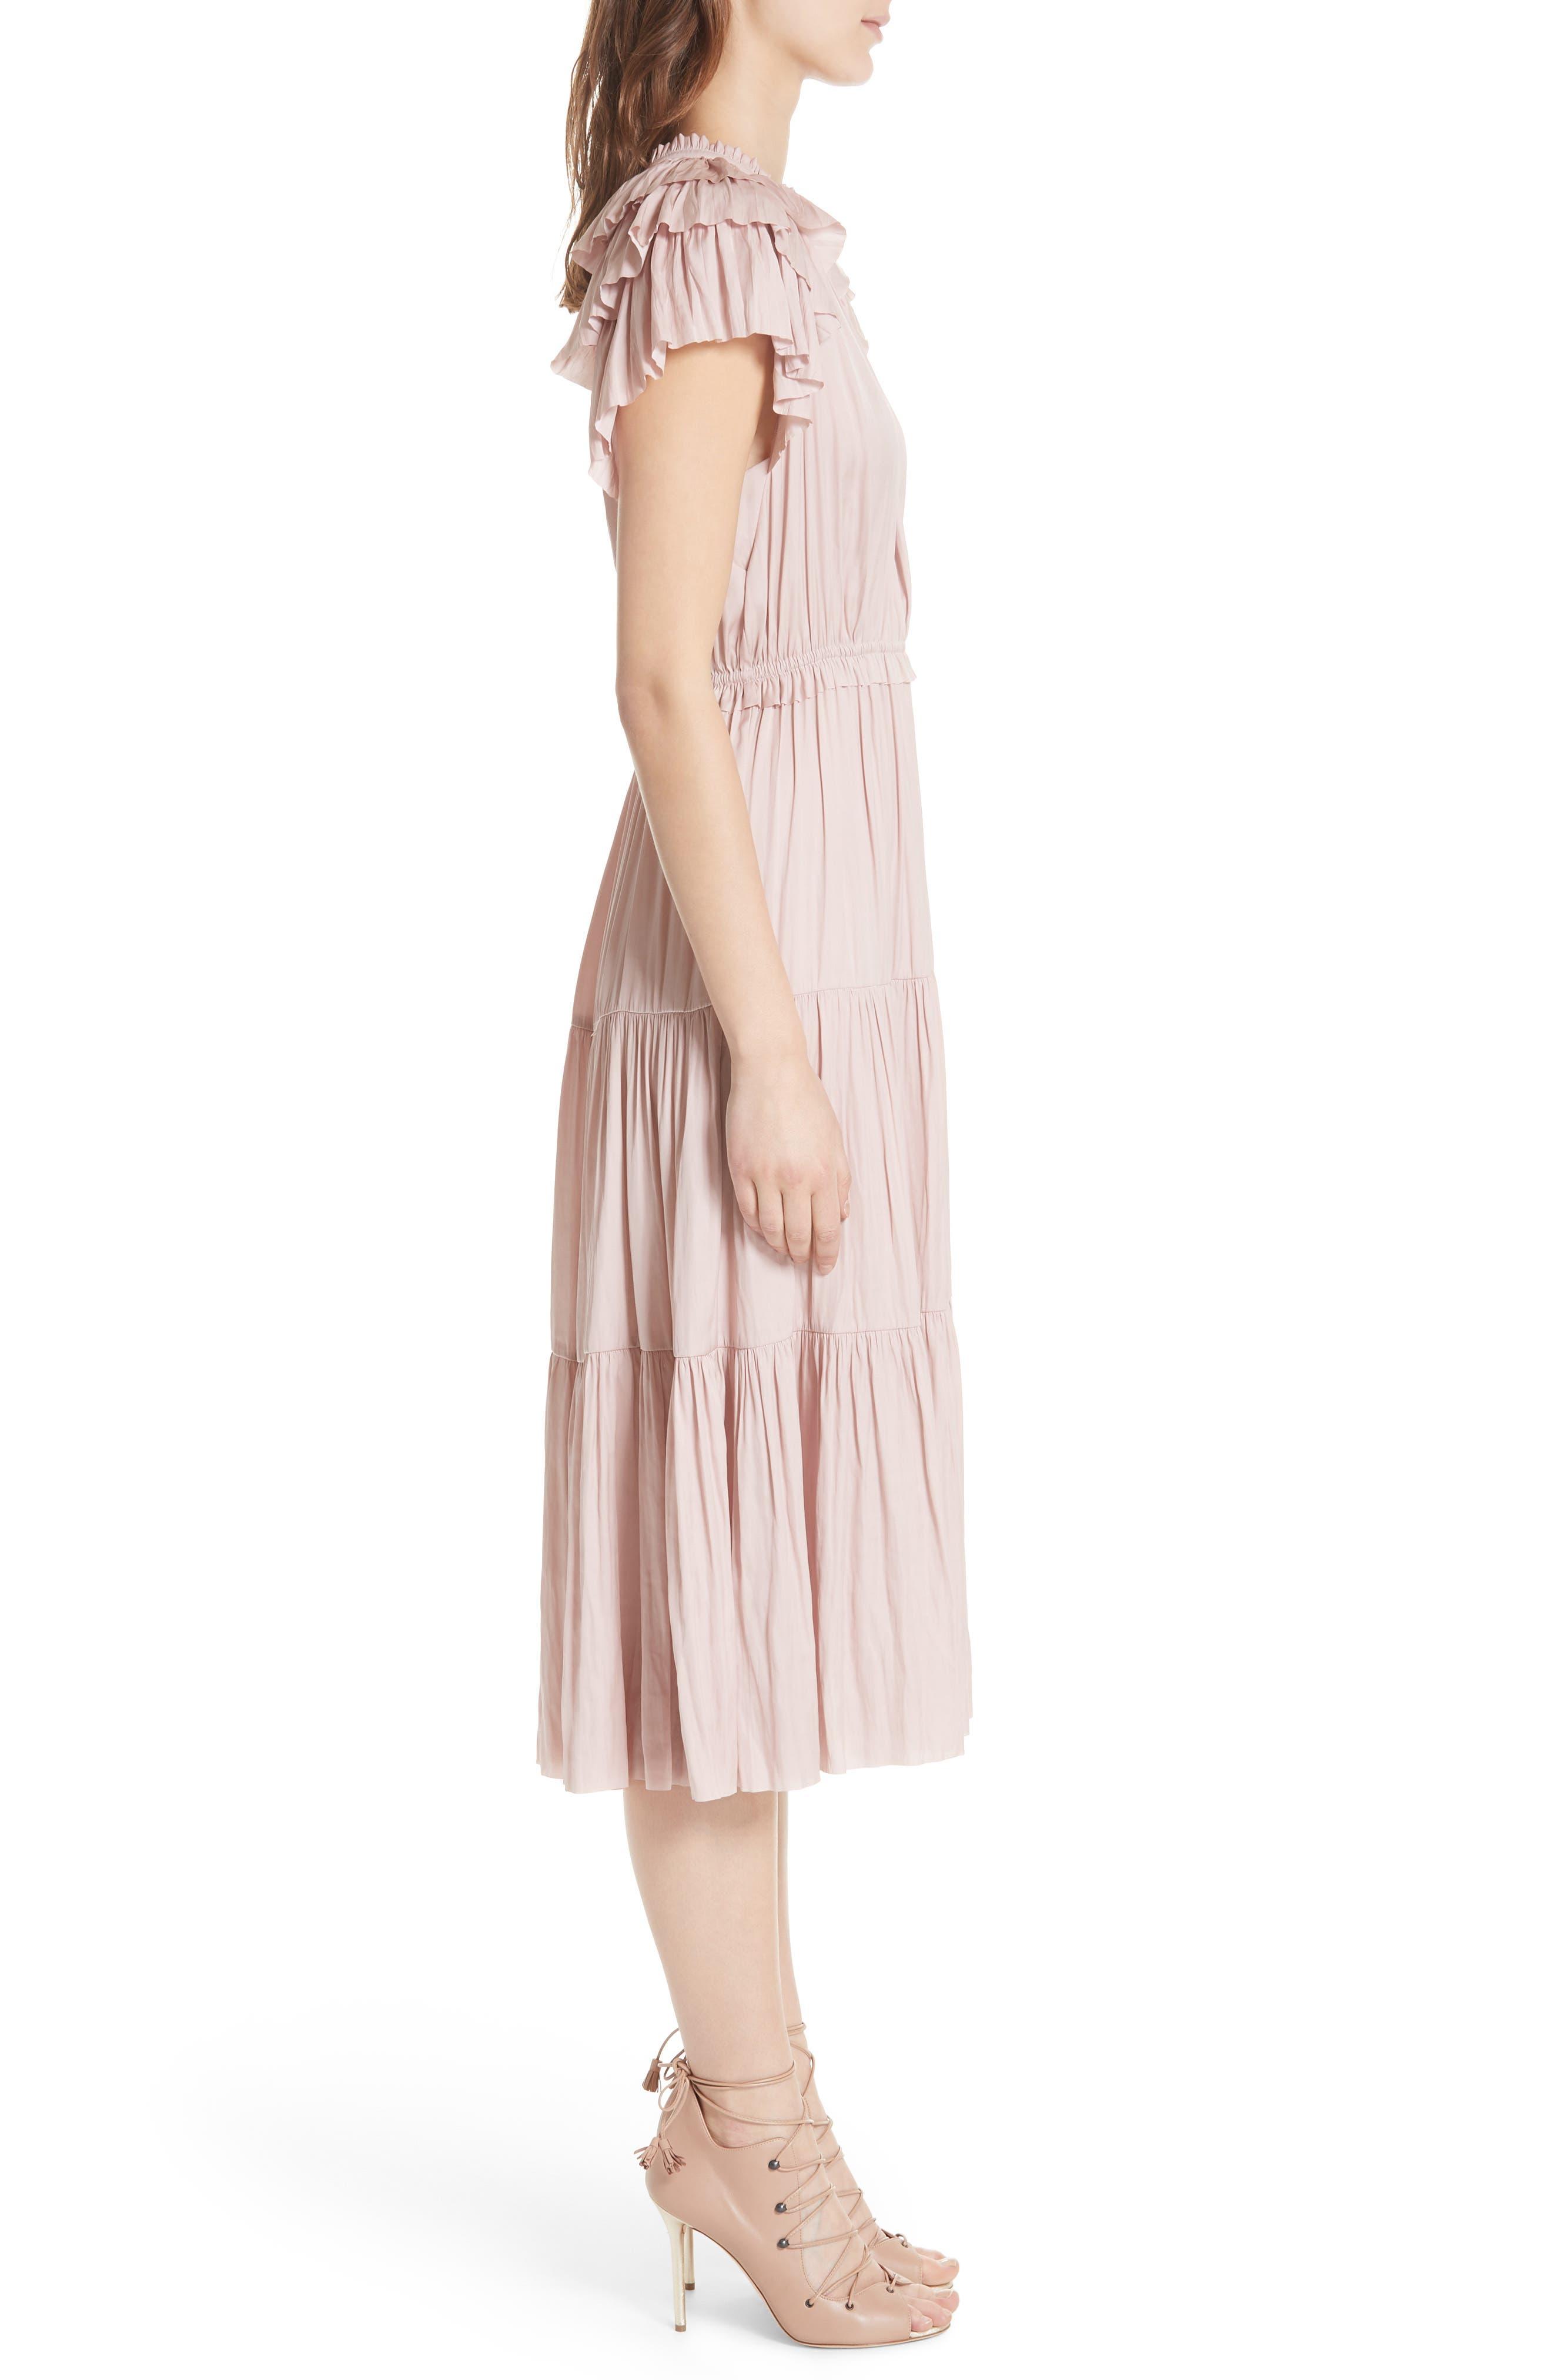 ULLA JOHNSON,                             Blaire Satin Dress,                             Alternate thumbnail 3, color,                             600